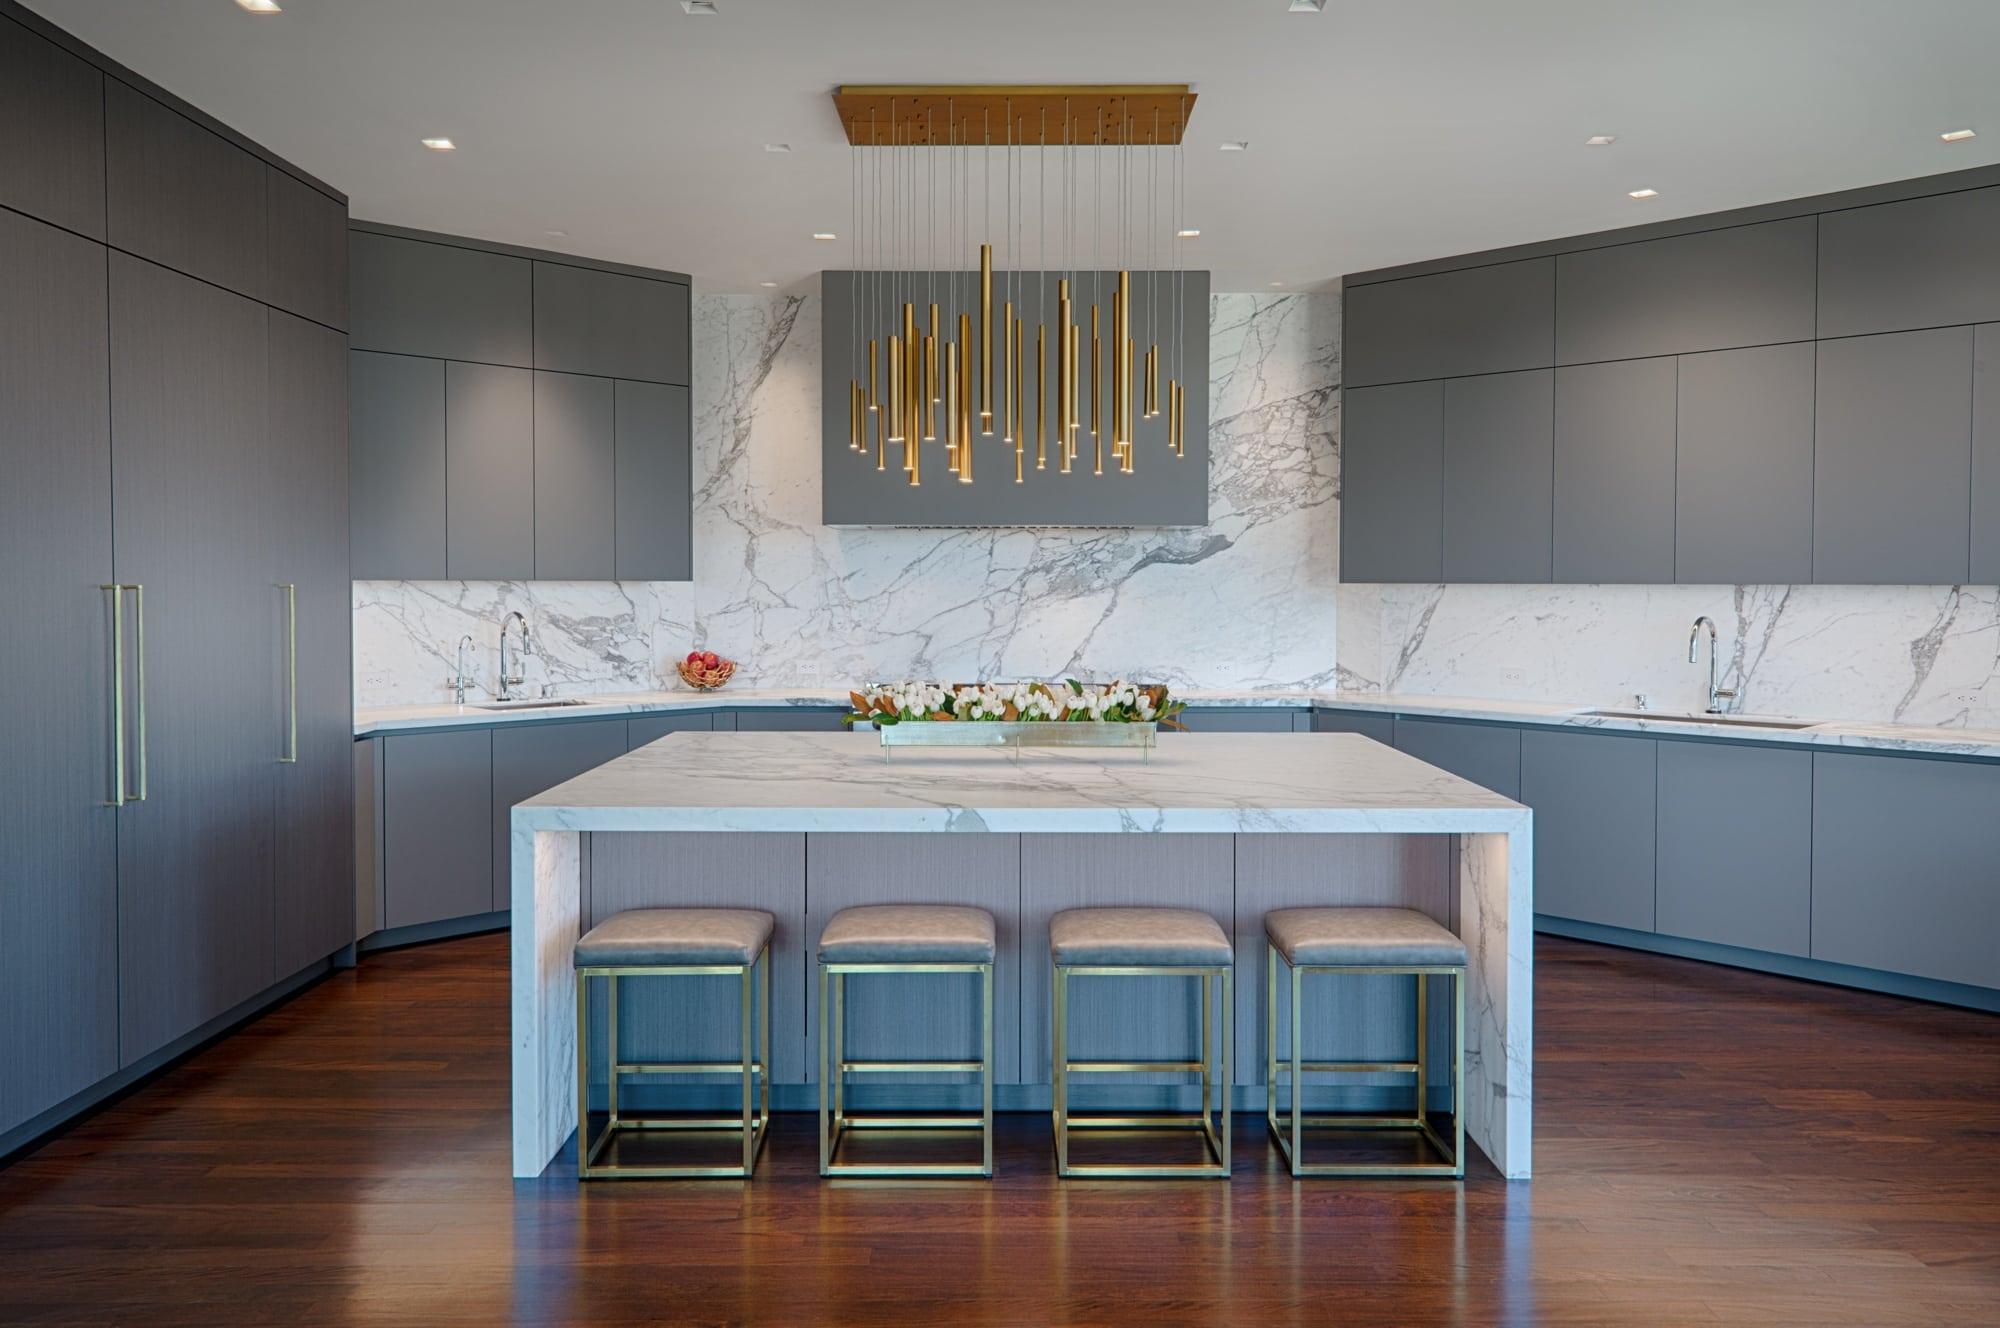 Luxury German Kitchen by eggersmann for Tiburon CA Owner